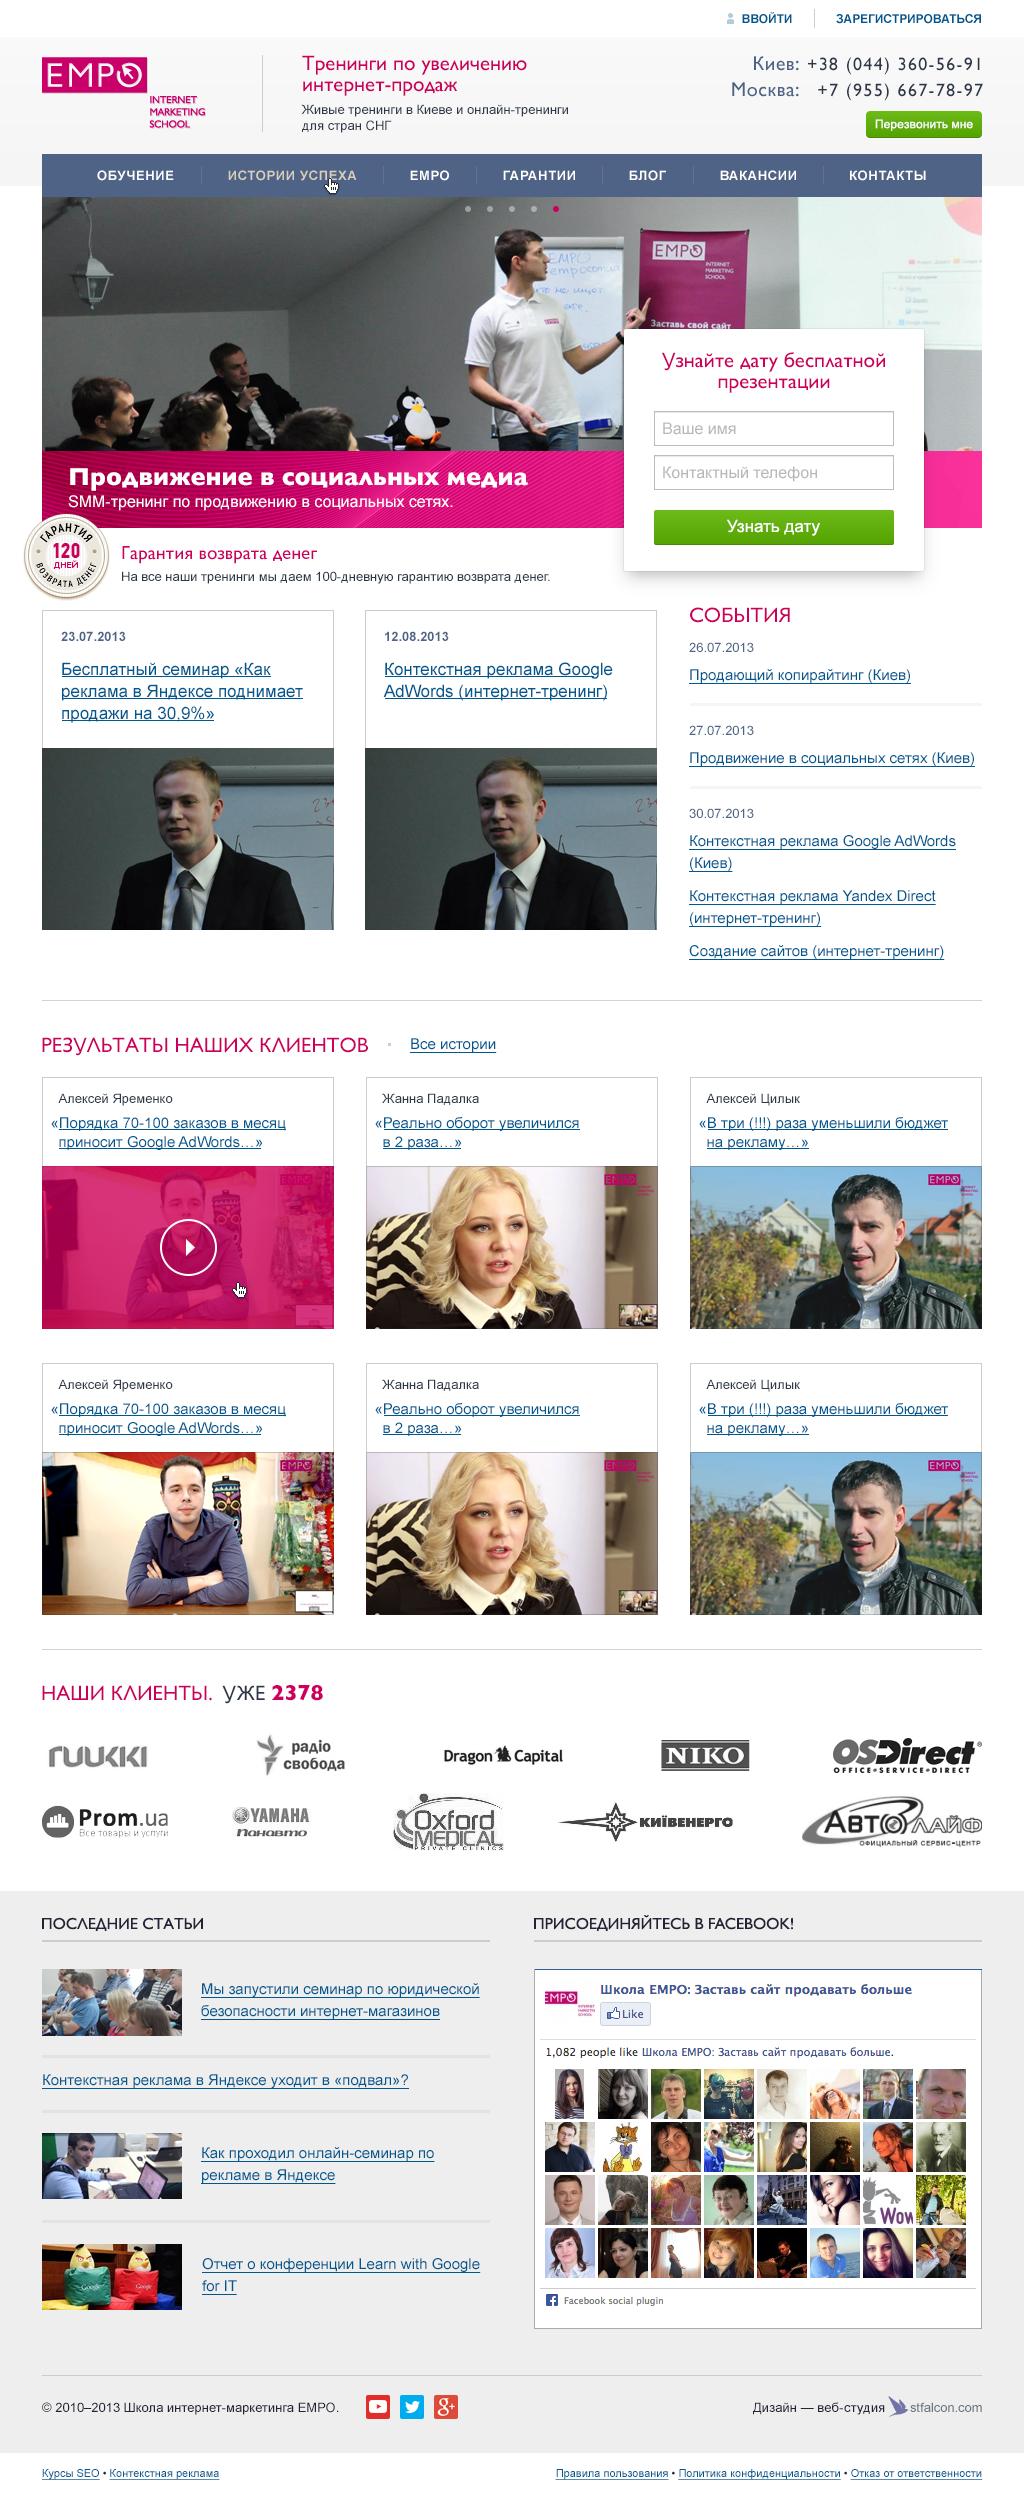 EMPO - сервис онлайн-обучения